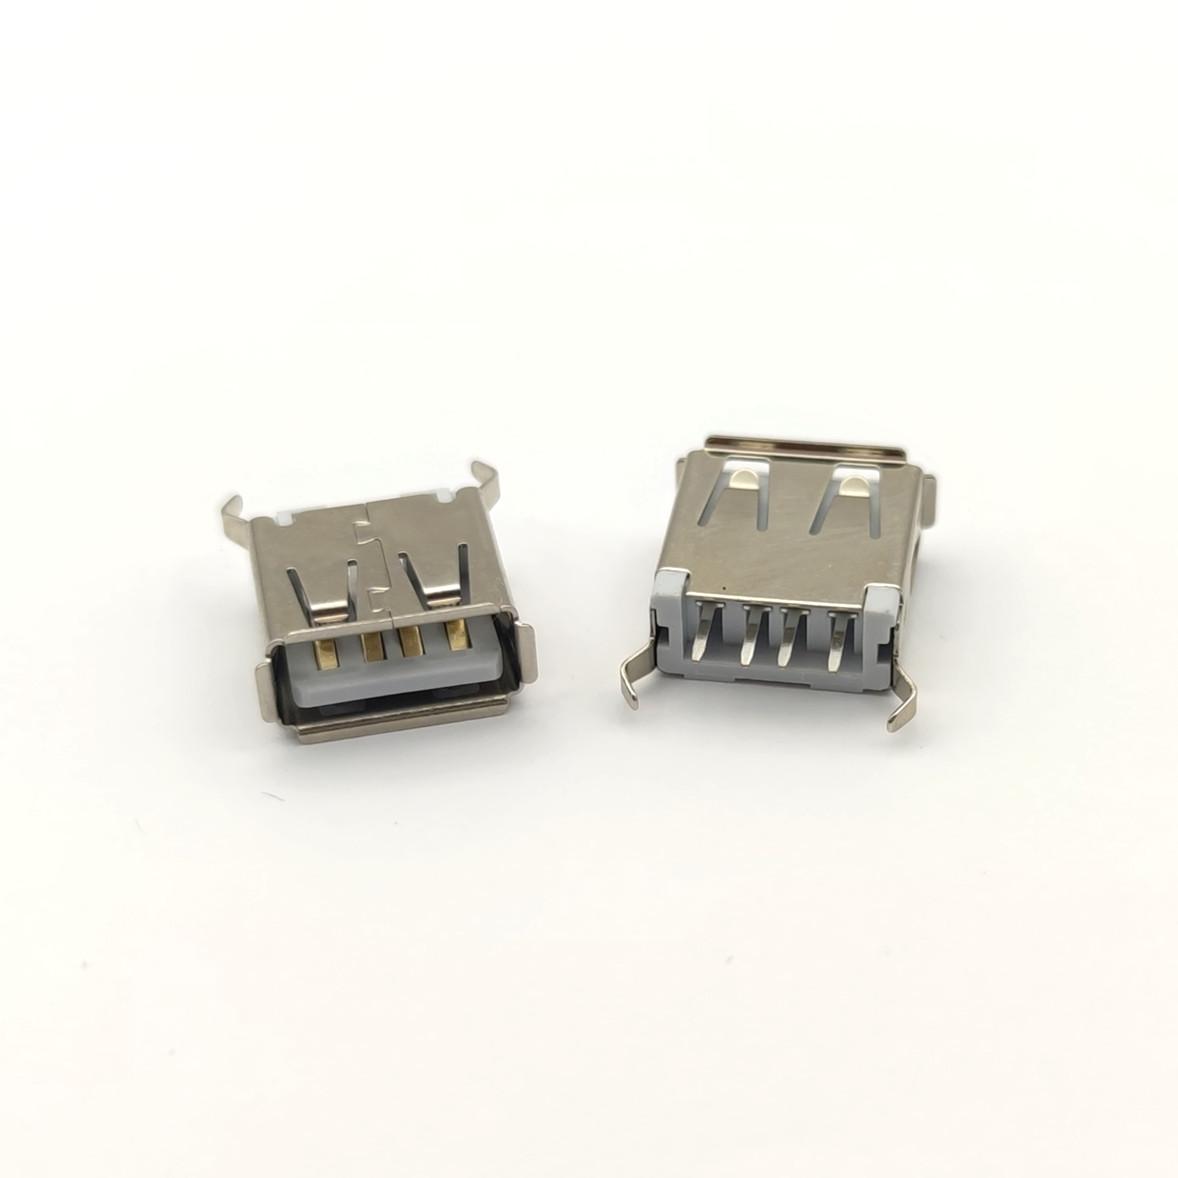 USB母座 4p 立式直插 180度 弯脚 白胶 卷边